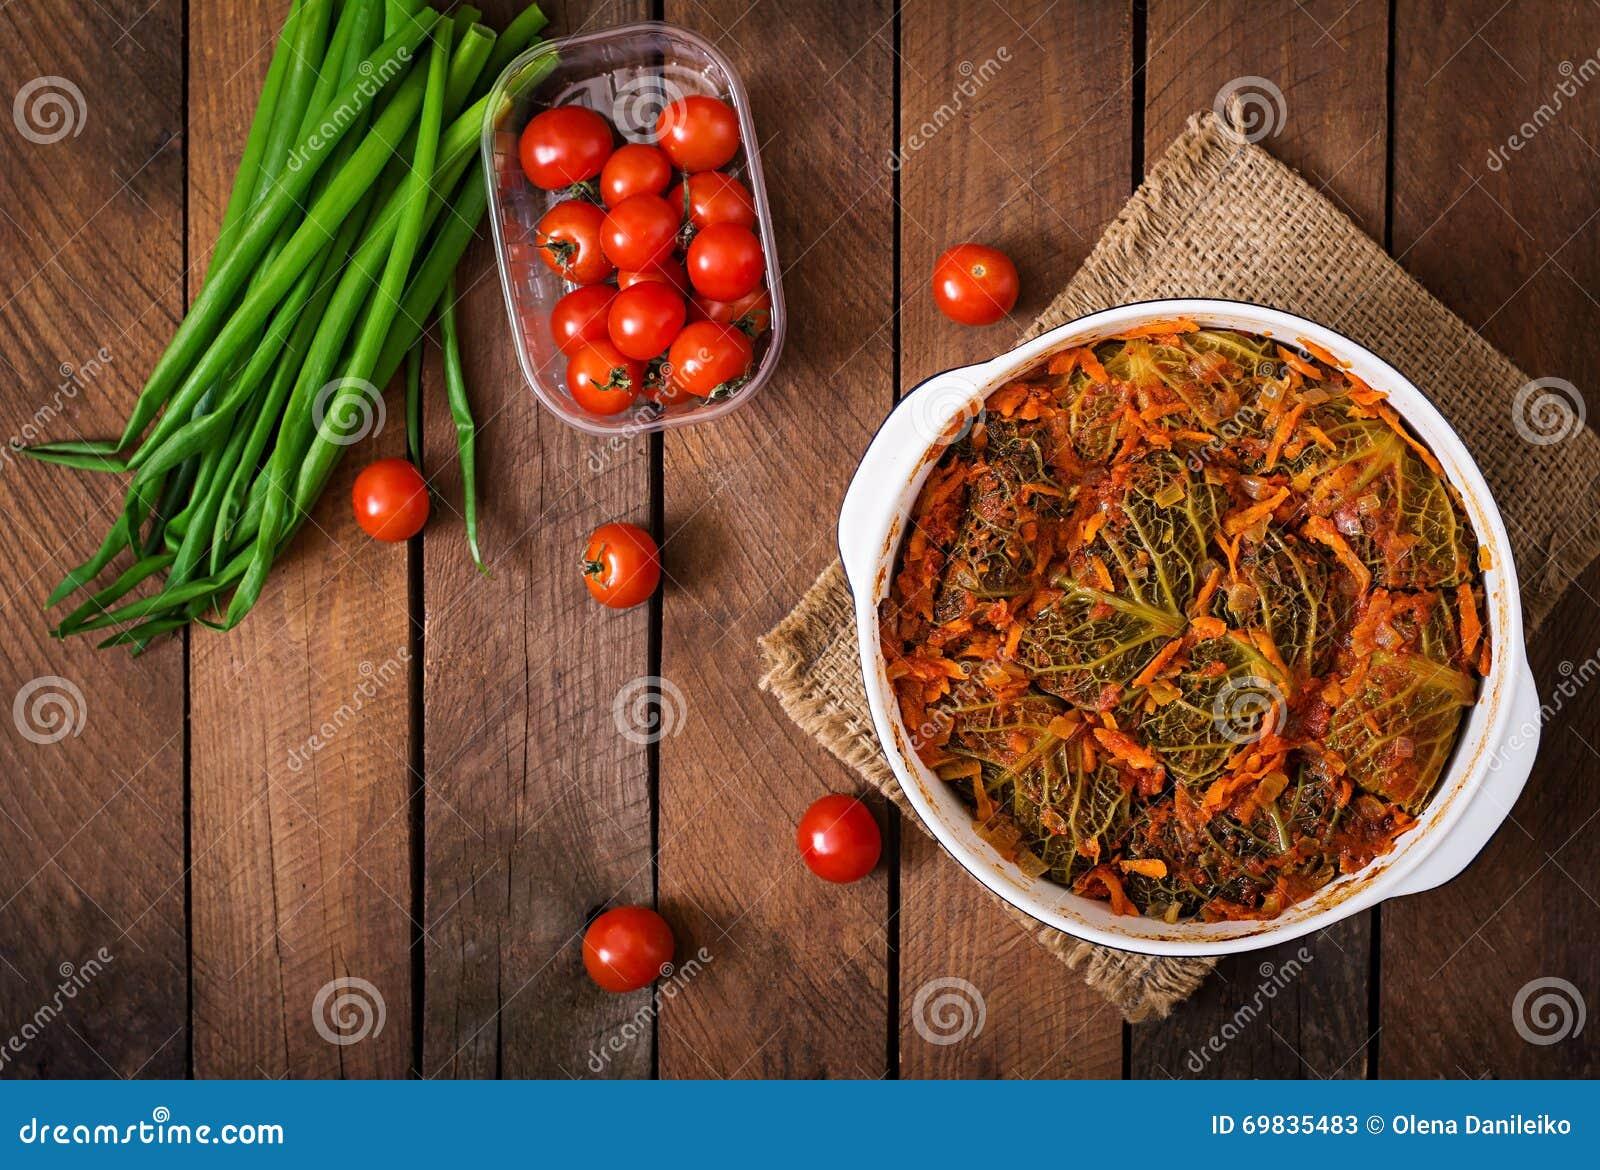 La col de col rizada rellena rueda en salsa de tomate